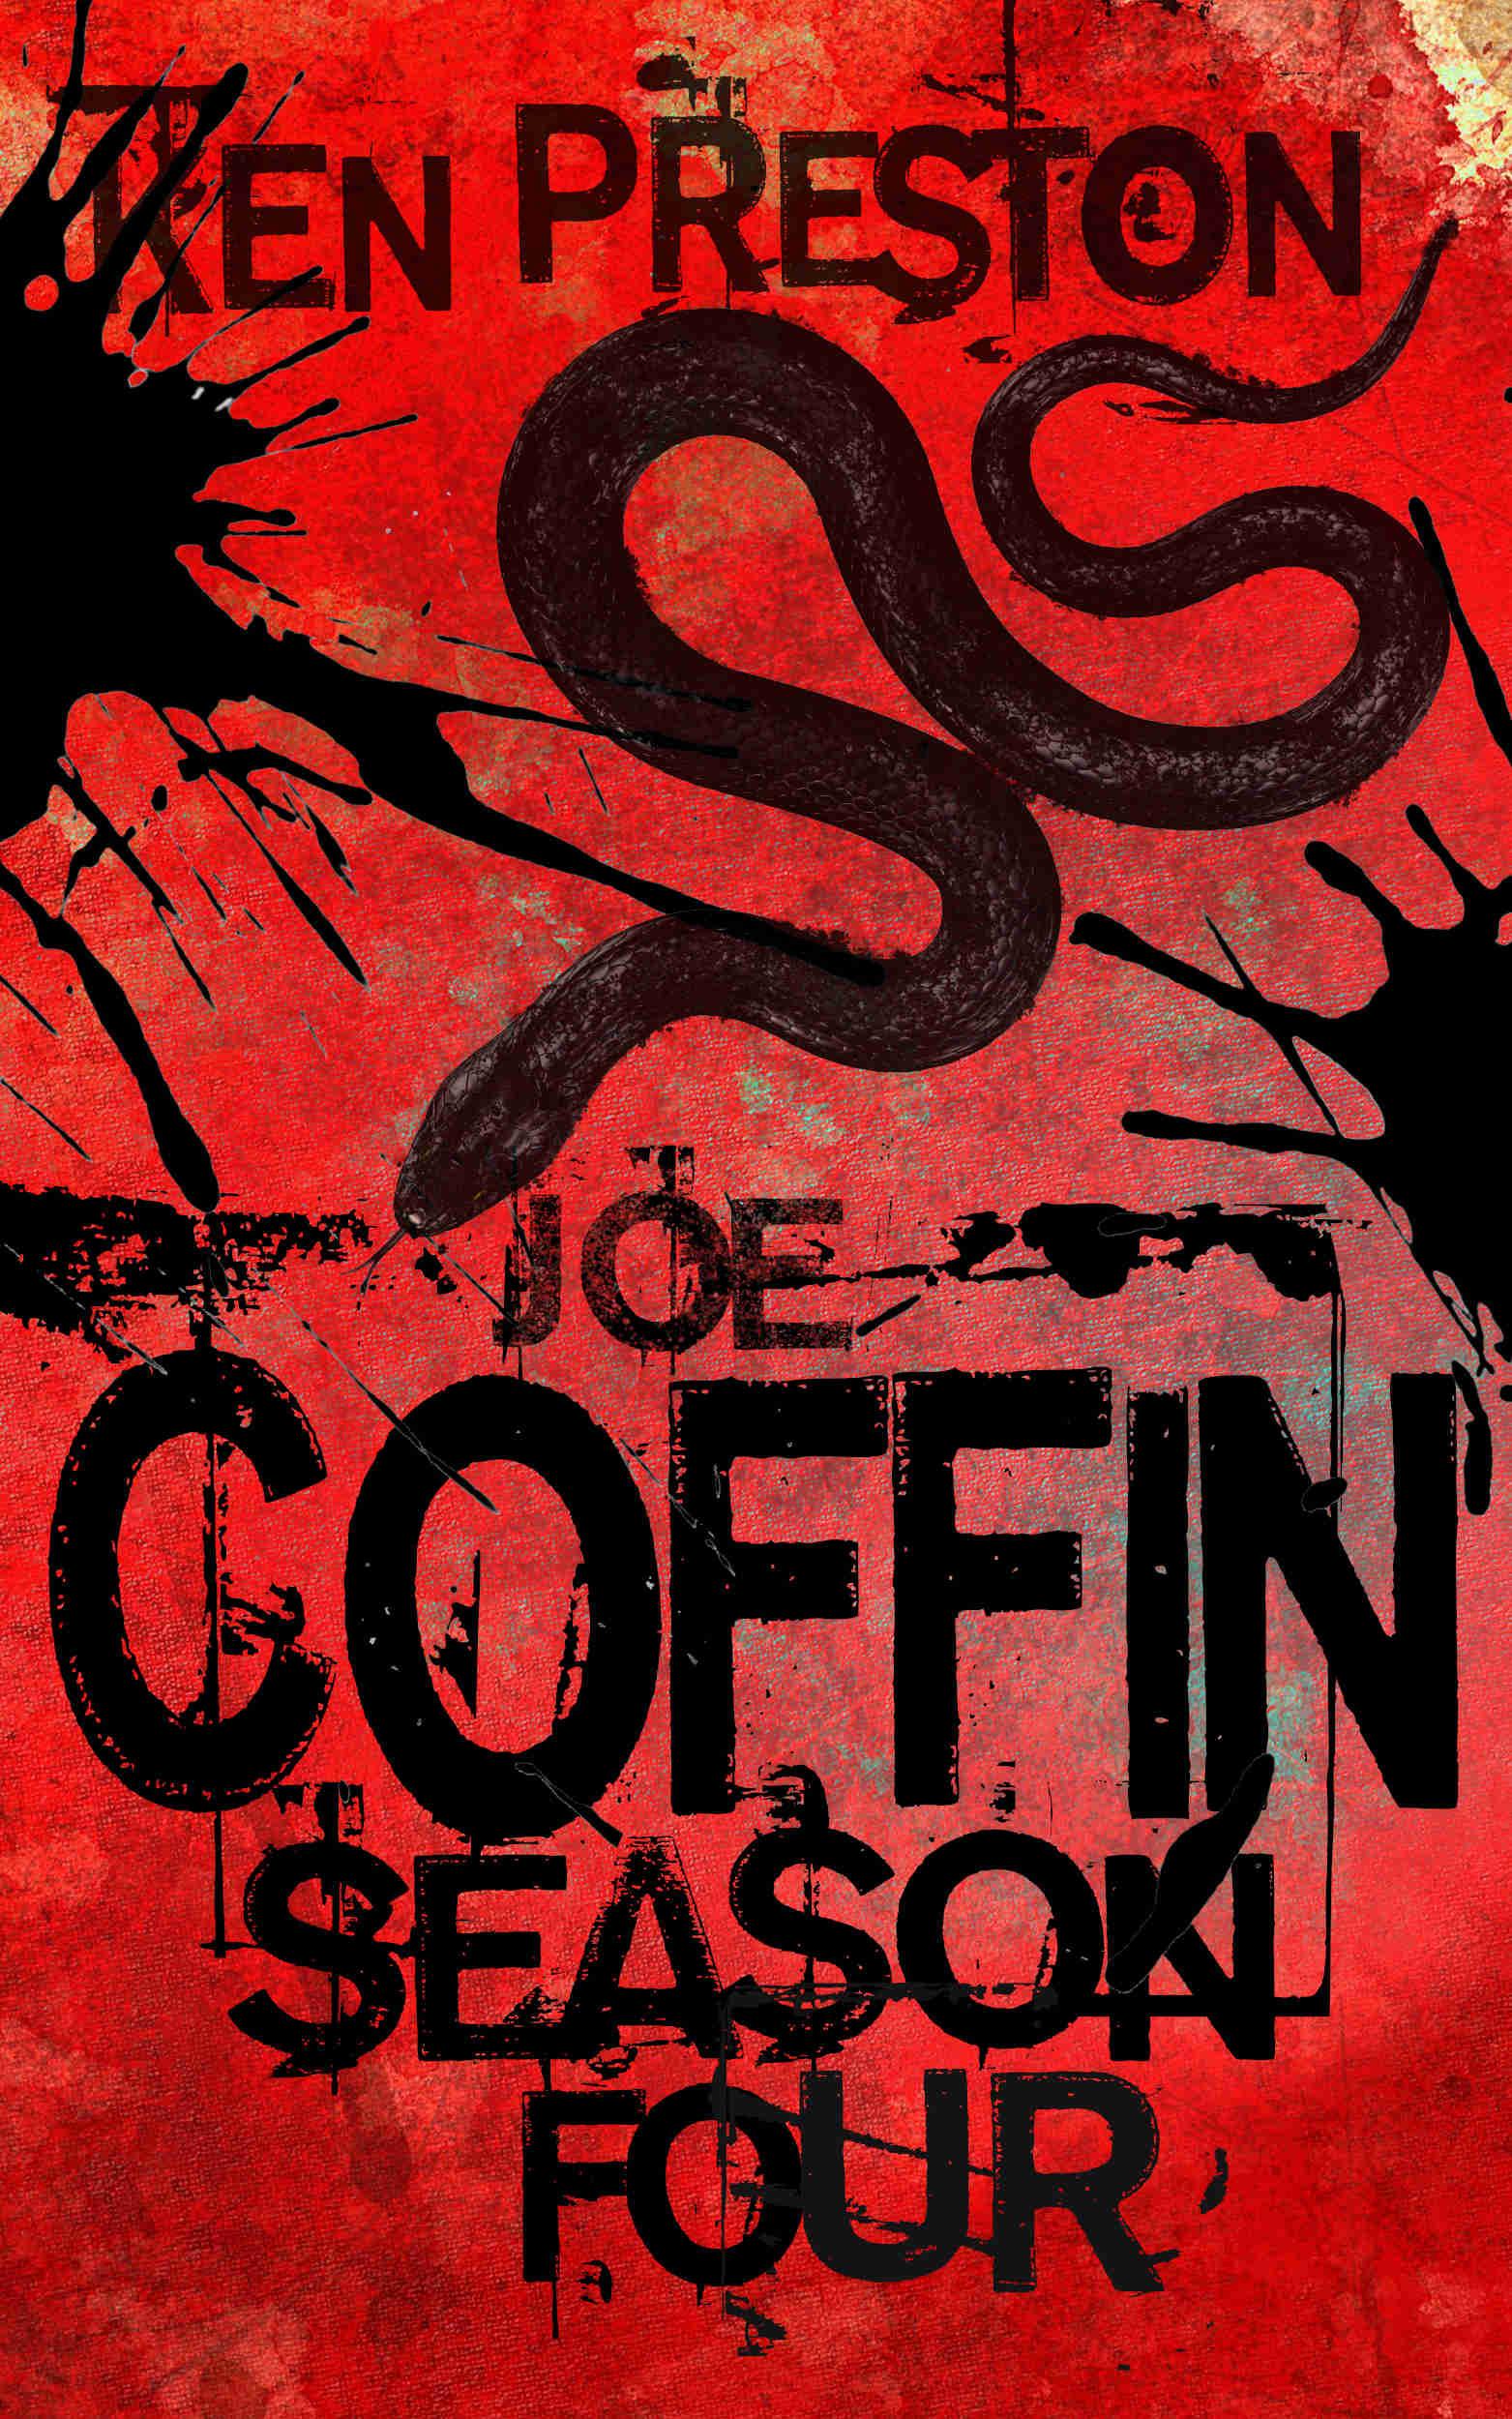 Joe Coffin Season Four Cover